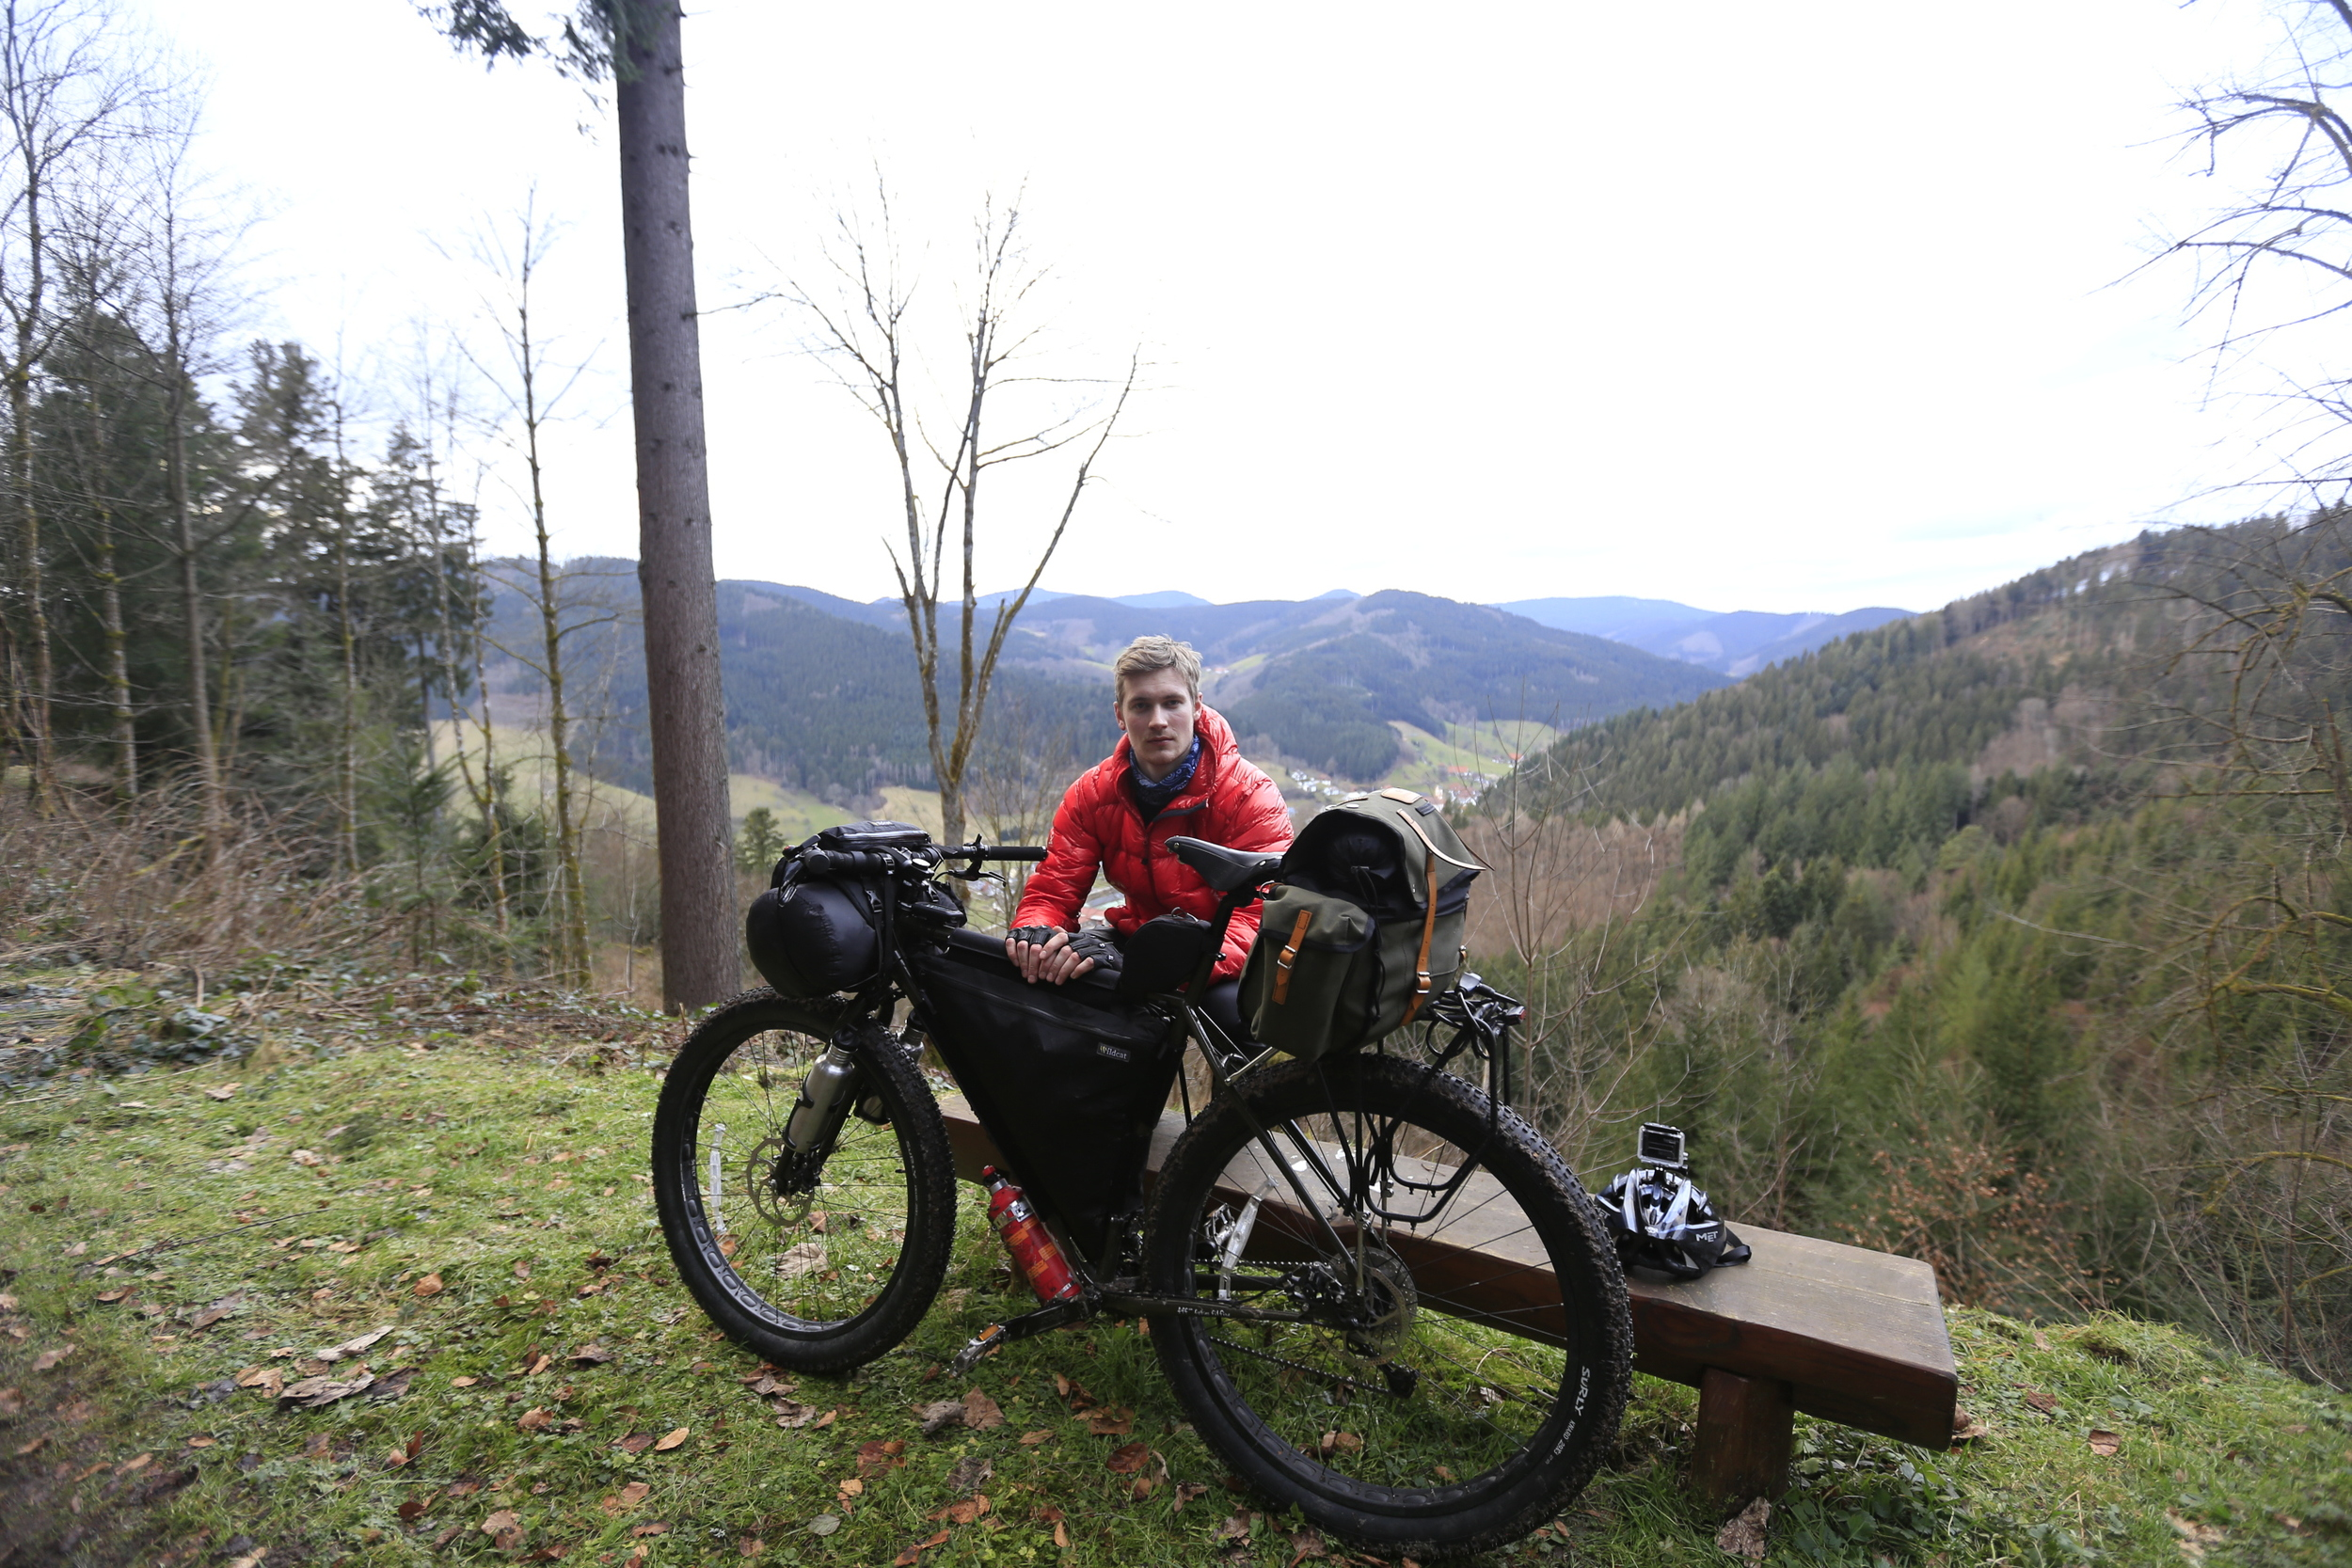 surly, surly ecr, ecr, bikepacking, bikepacking blog, cycling blog, knards, 29er, brooks, carradice, gopro, gopro hero, gopro hero 3, germany, black forest, singletrack, mtb, travel, adventure, fat bike, fat biking, bicycle touring apocalypse